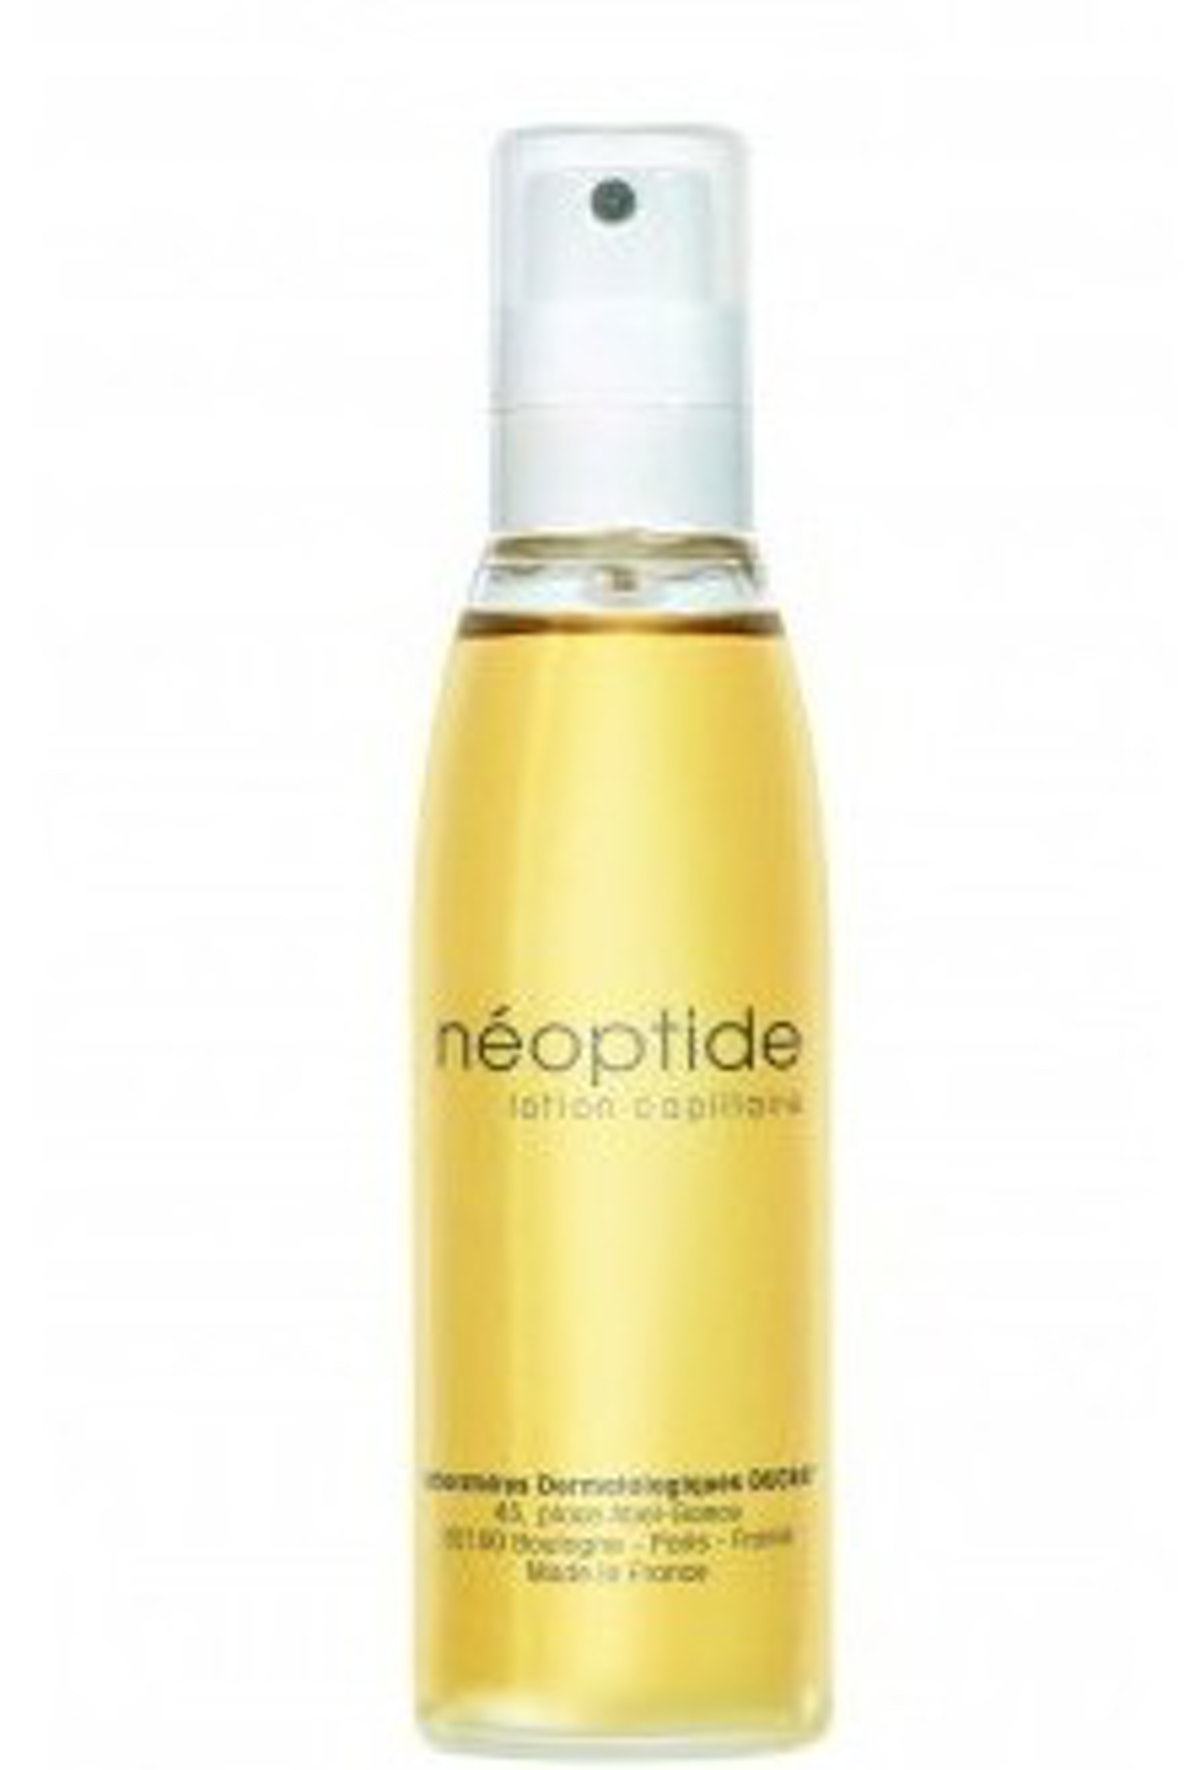 Glytone By Ducray Neoptide Hair Lotion Spray